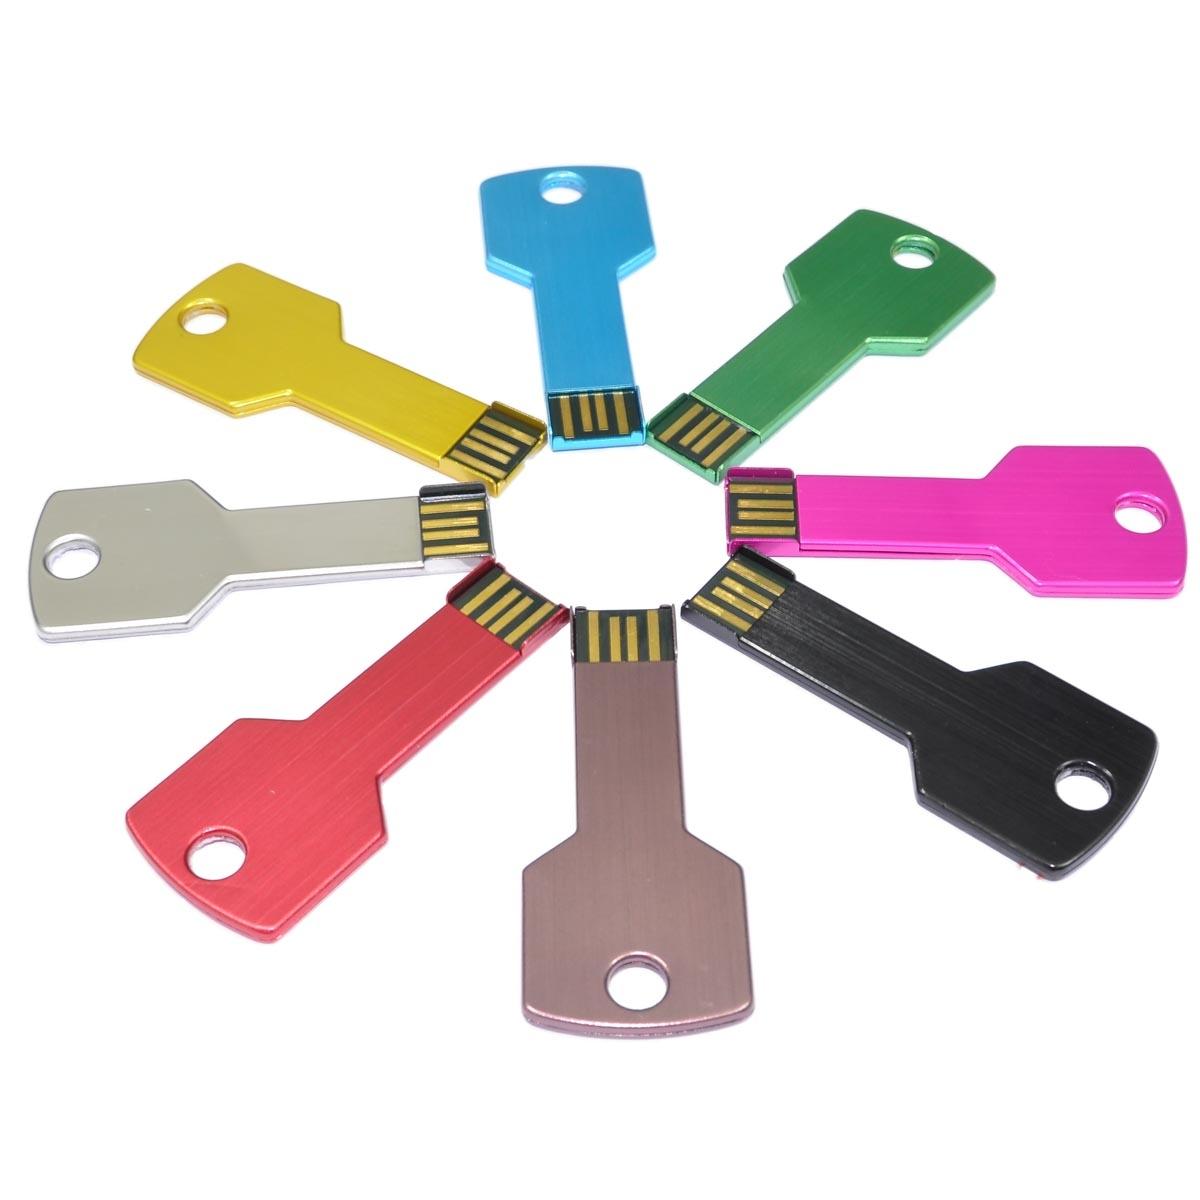 Metal Key Thumbdrive